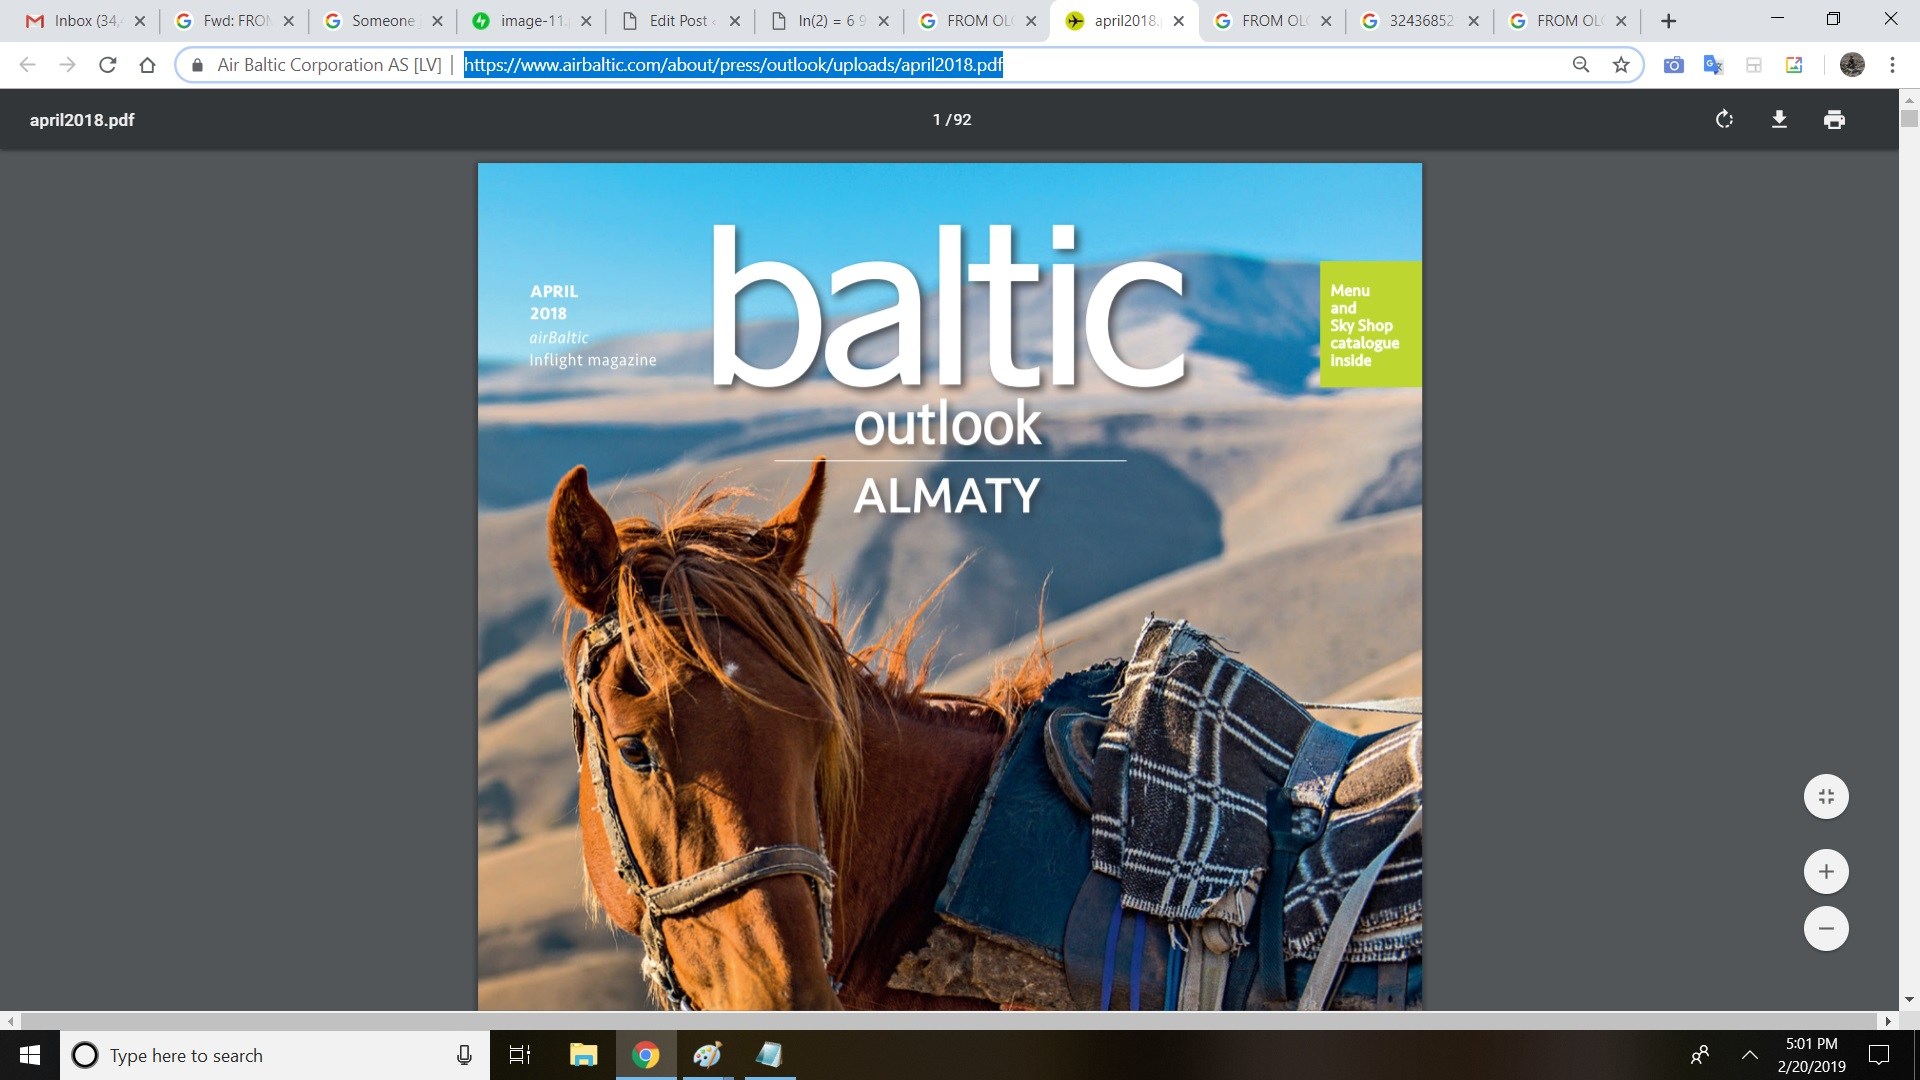 OLGA SHULMAN LEDNICHENKO MISHRA CLINTON NETANYAHU CAR AND PANACE ARE ELEMENATRY - HERE IS THE HORSE IN PAKSITAN BHARAT AND AFHAN